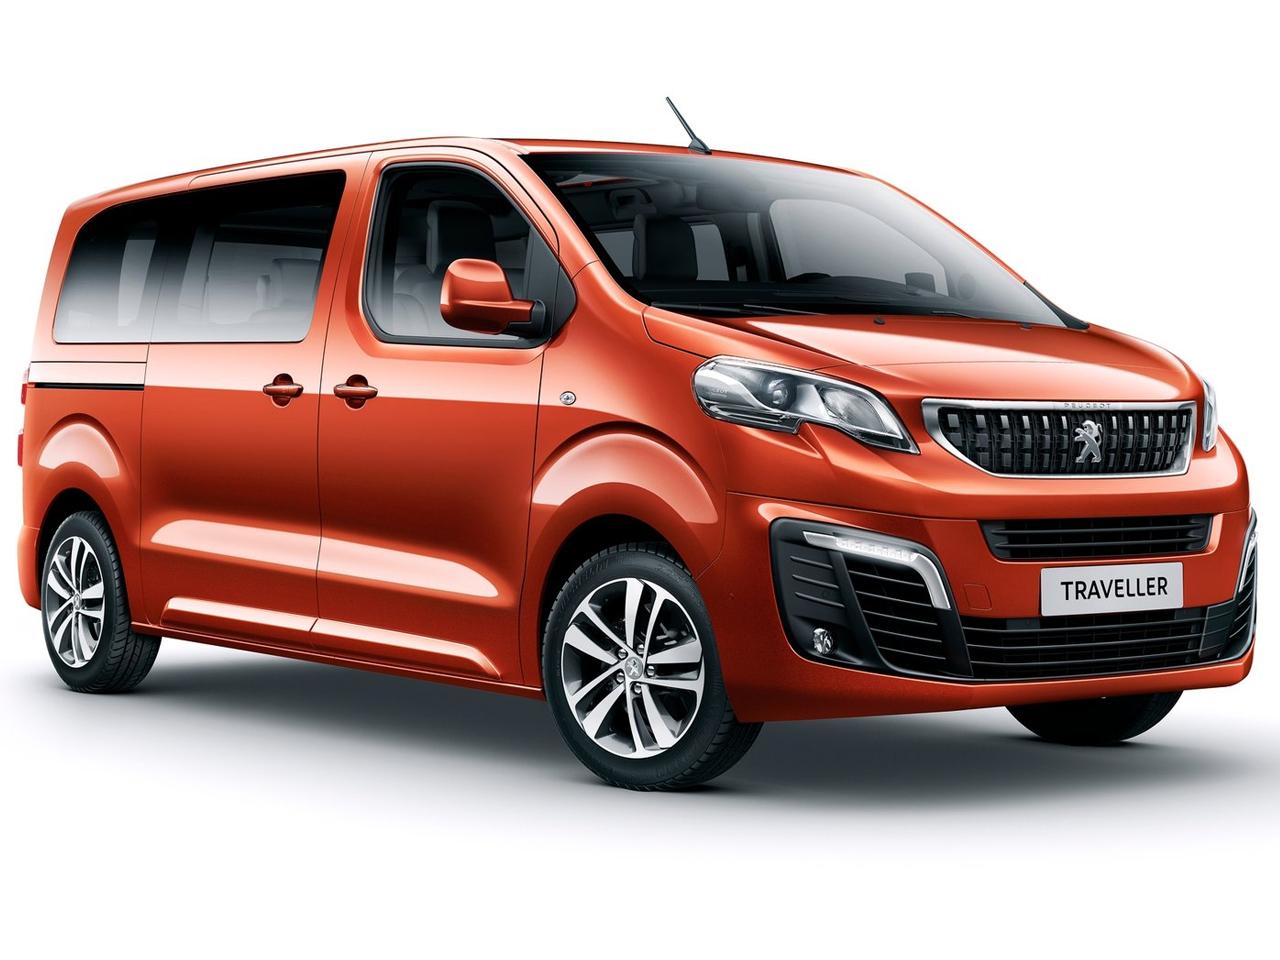 Peugeot Traveller exterior